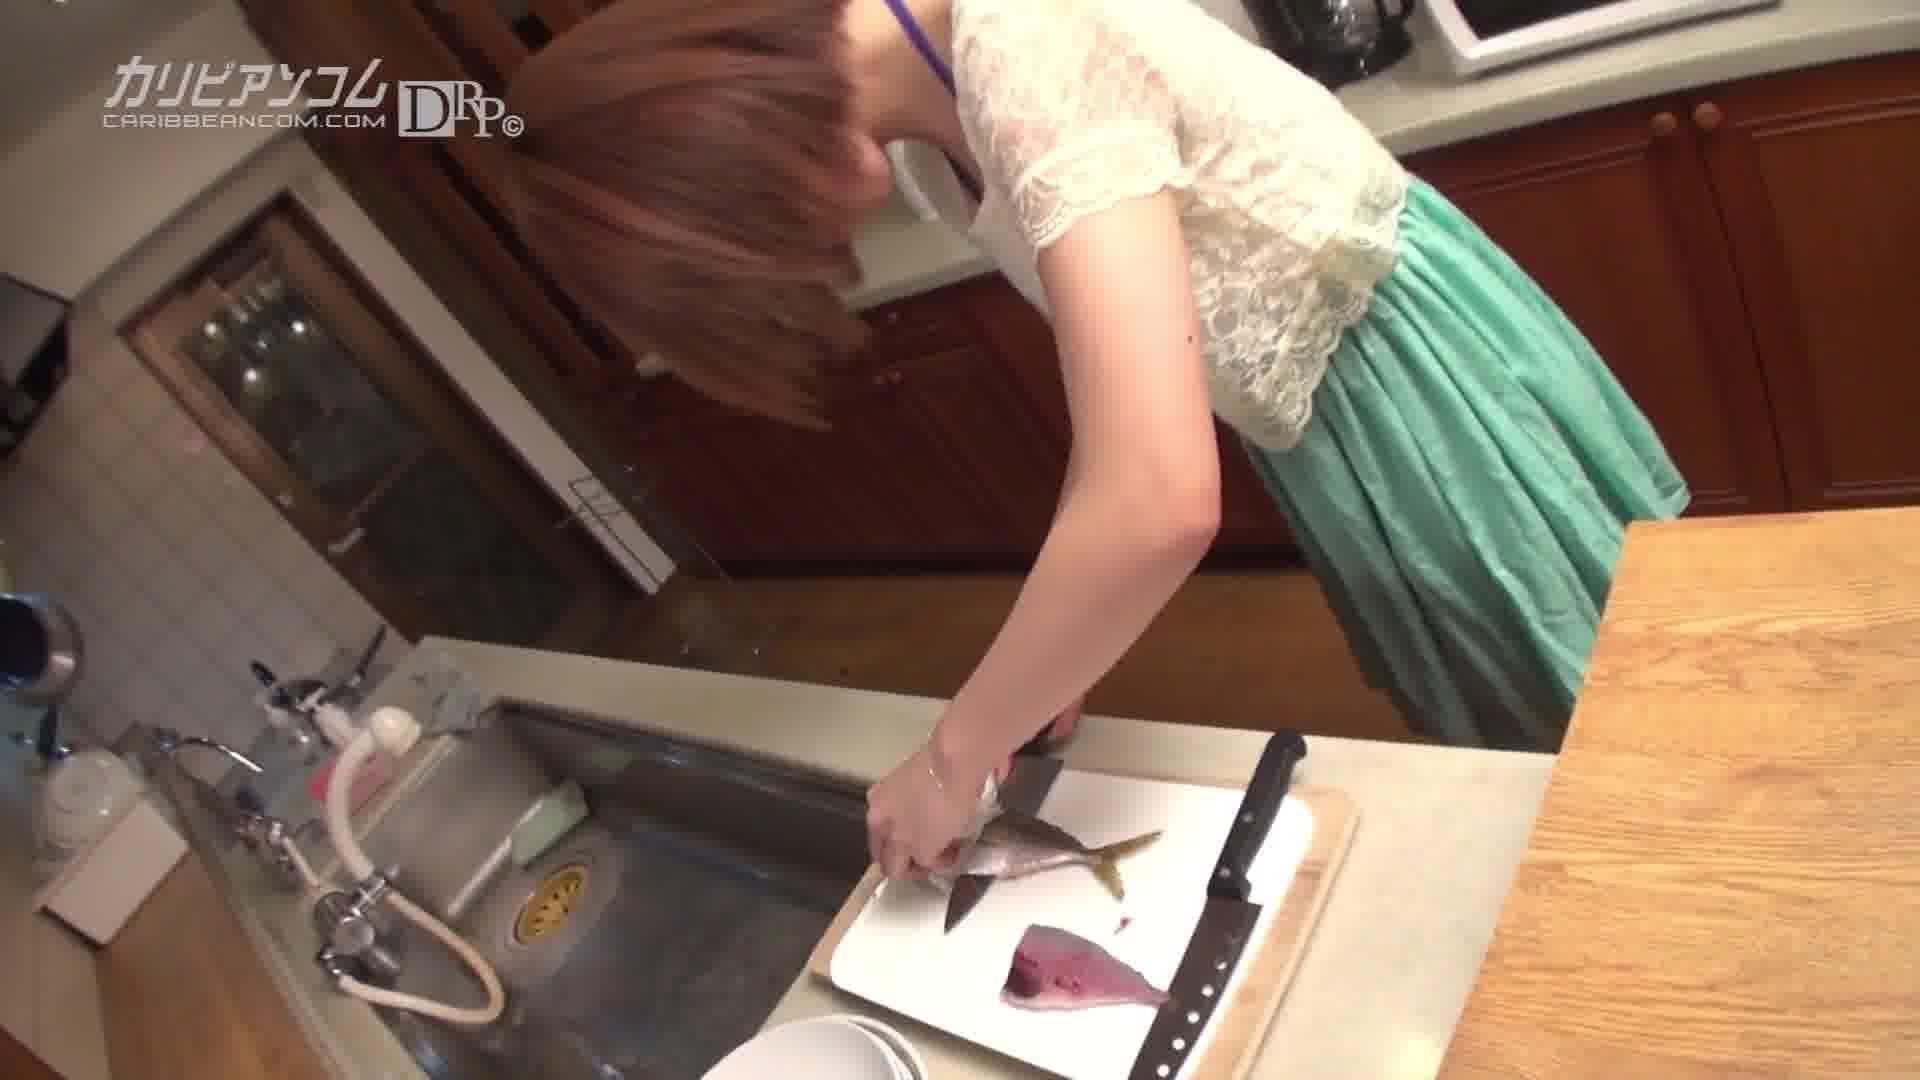 AVプロダクション対抗チキチキ海釣り大会 PART3 - 桜瀬奈【痴女・乱交・潮吹き】